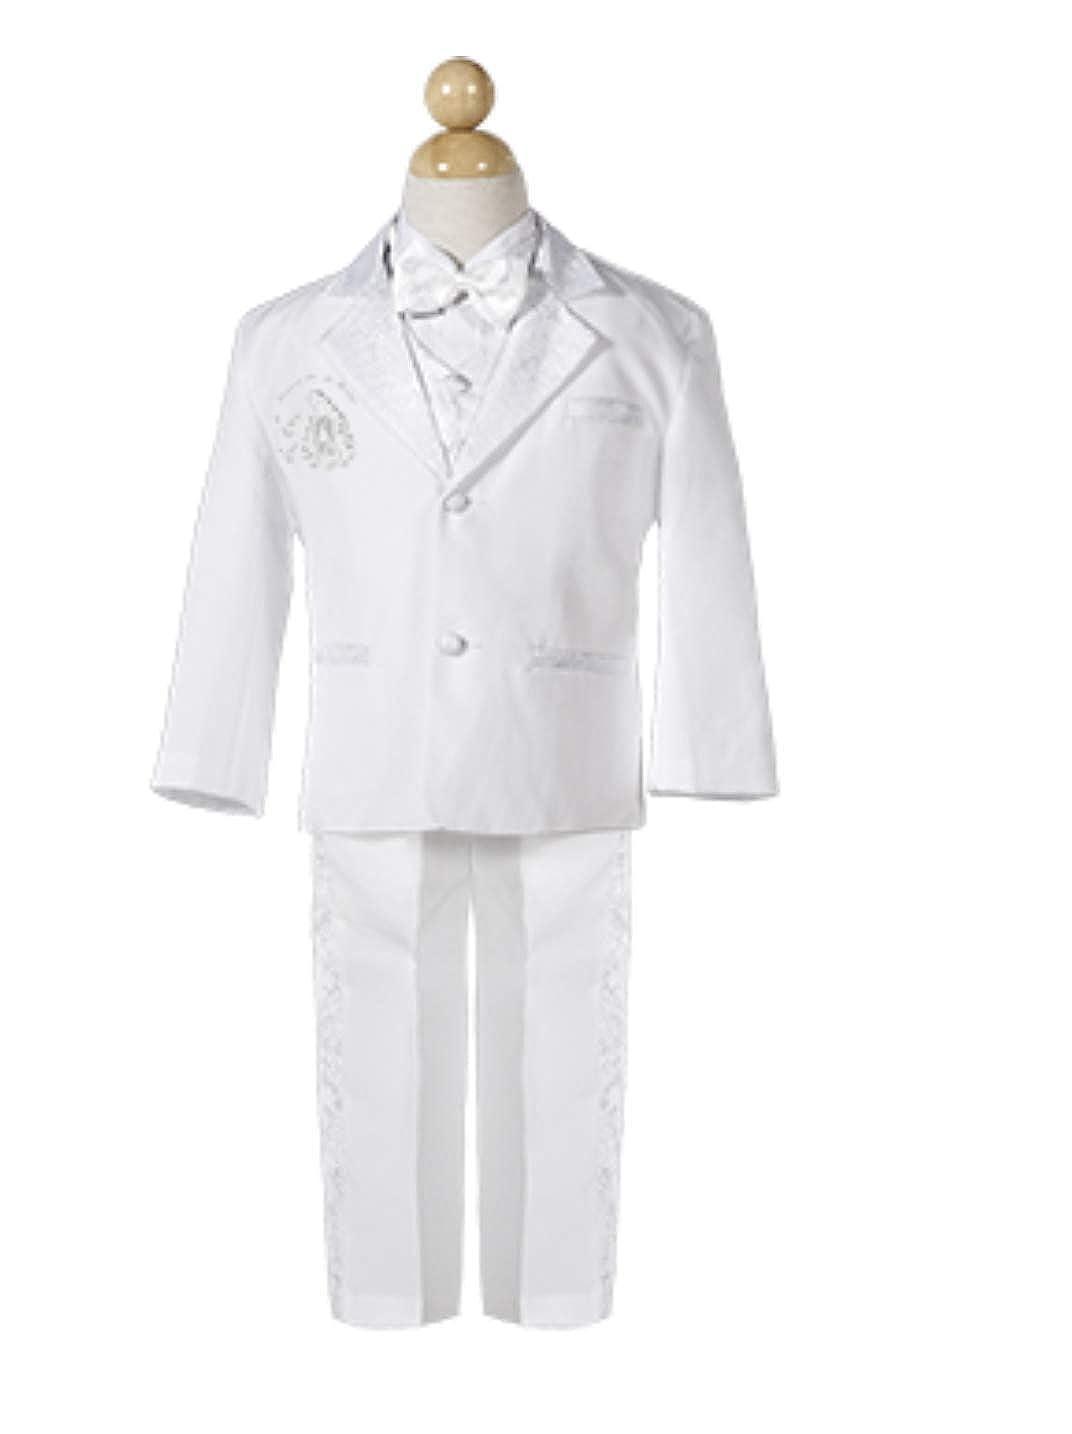 Amazon.com: Boys Baptism/Christening Suit, Traje De Bautizo ...